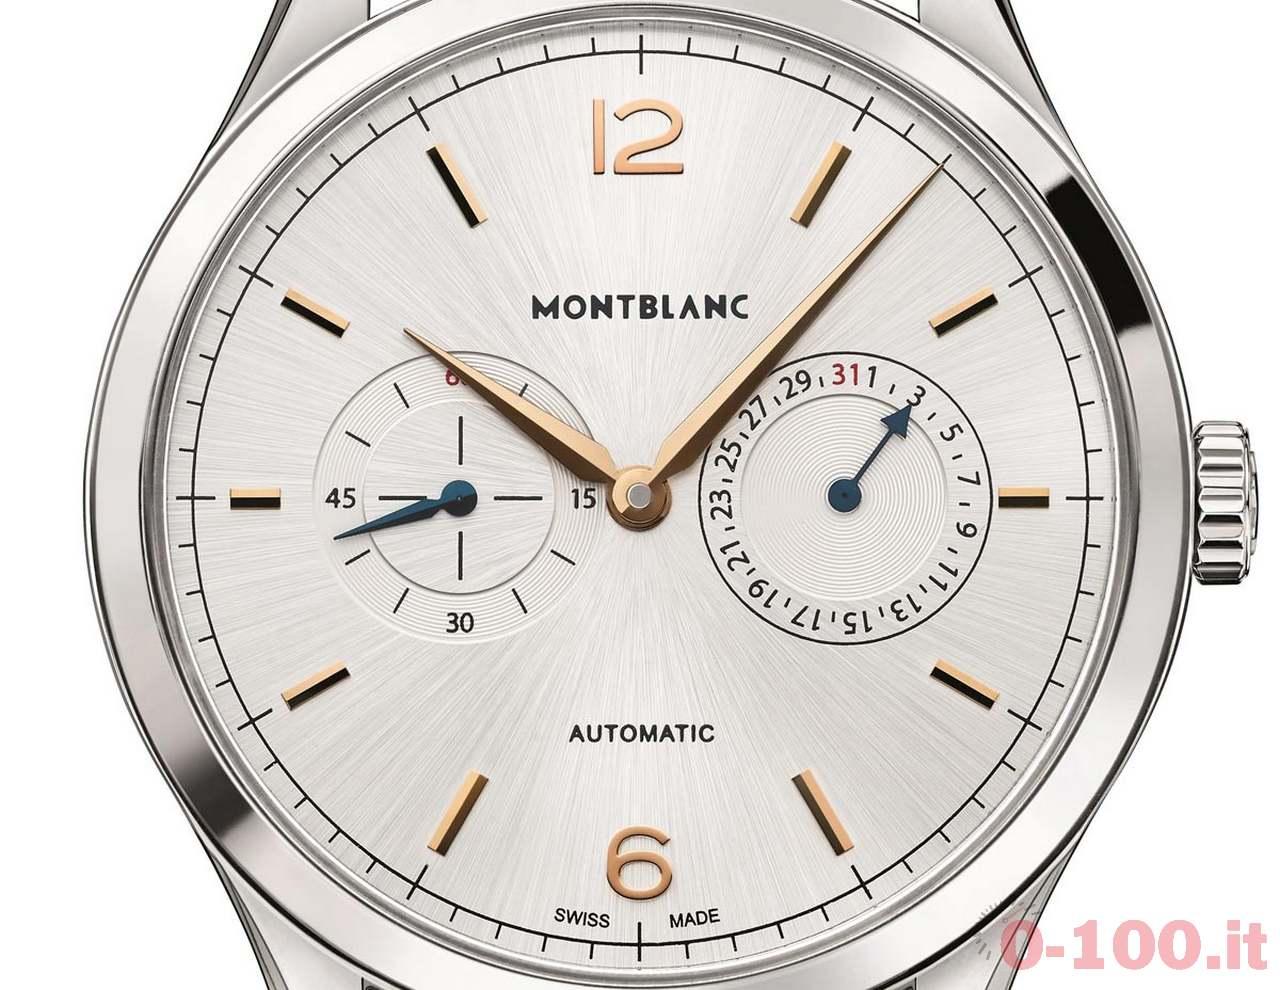 anteprima-sihh-2016-montblanc-heritage-chronometrie-twincounter-date-prezzo-price_0-1001